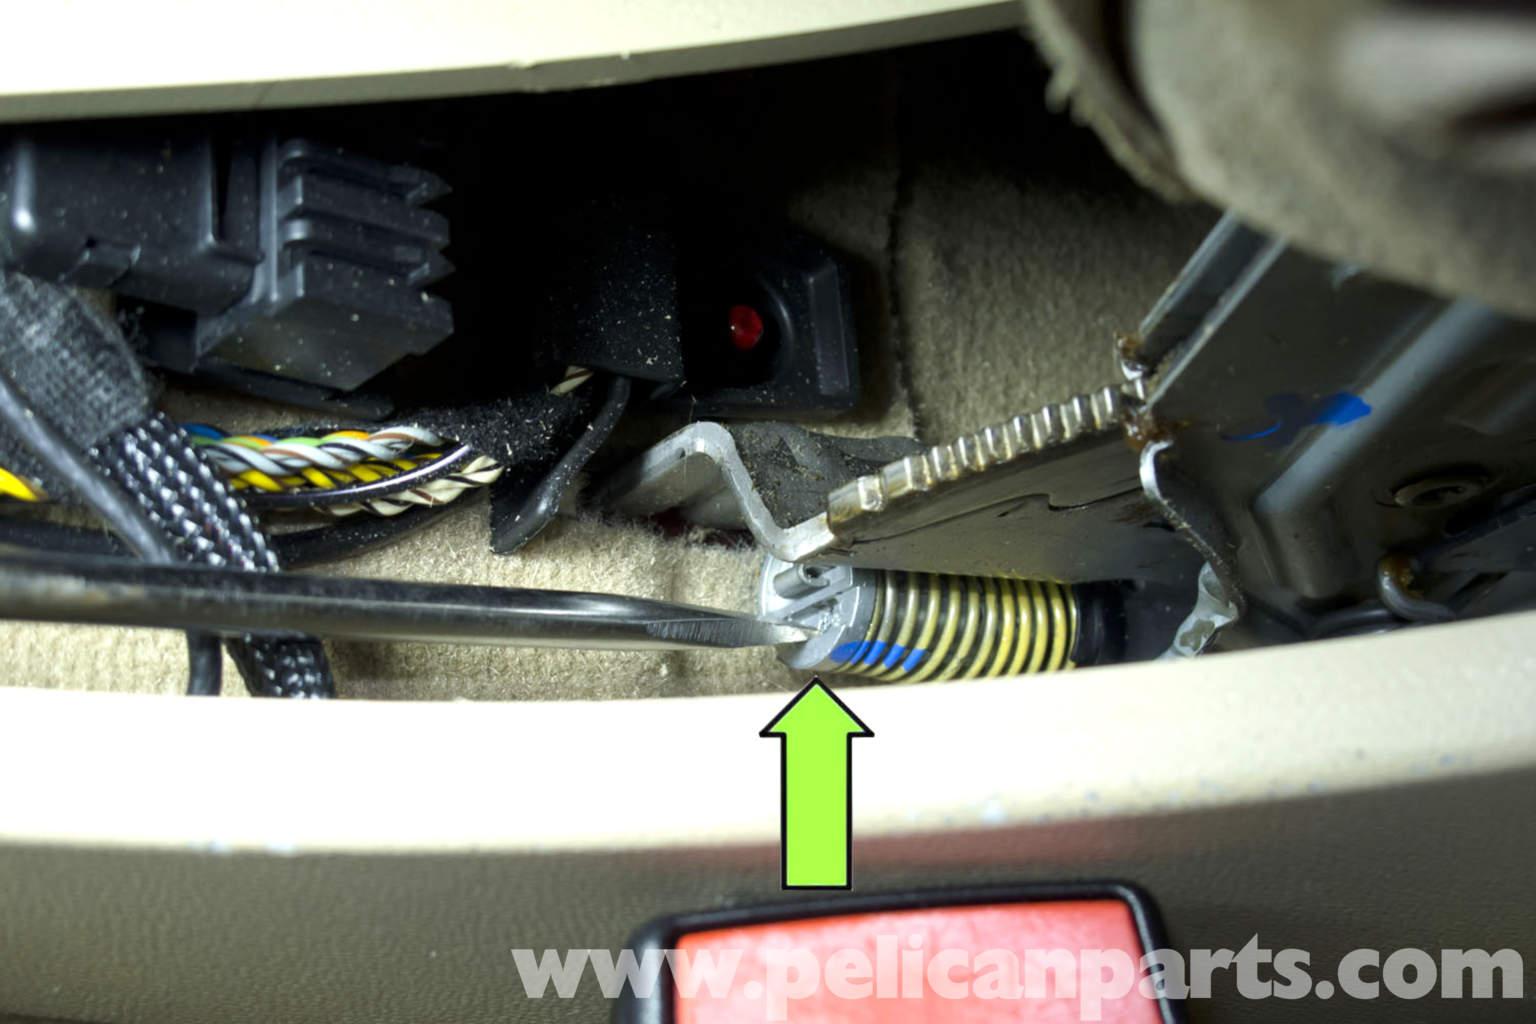 saab 9 3 trailer wiring bmw e90 parking brake adjustment e91  e92  e93 pelican  bmw e90 parking brake adjustment e91  e92  e93 pelican